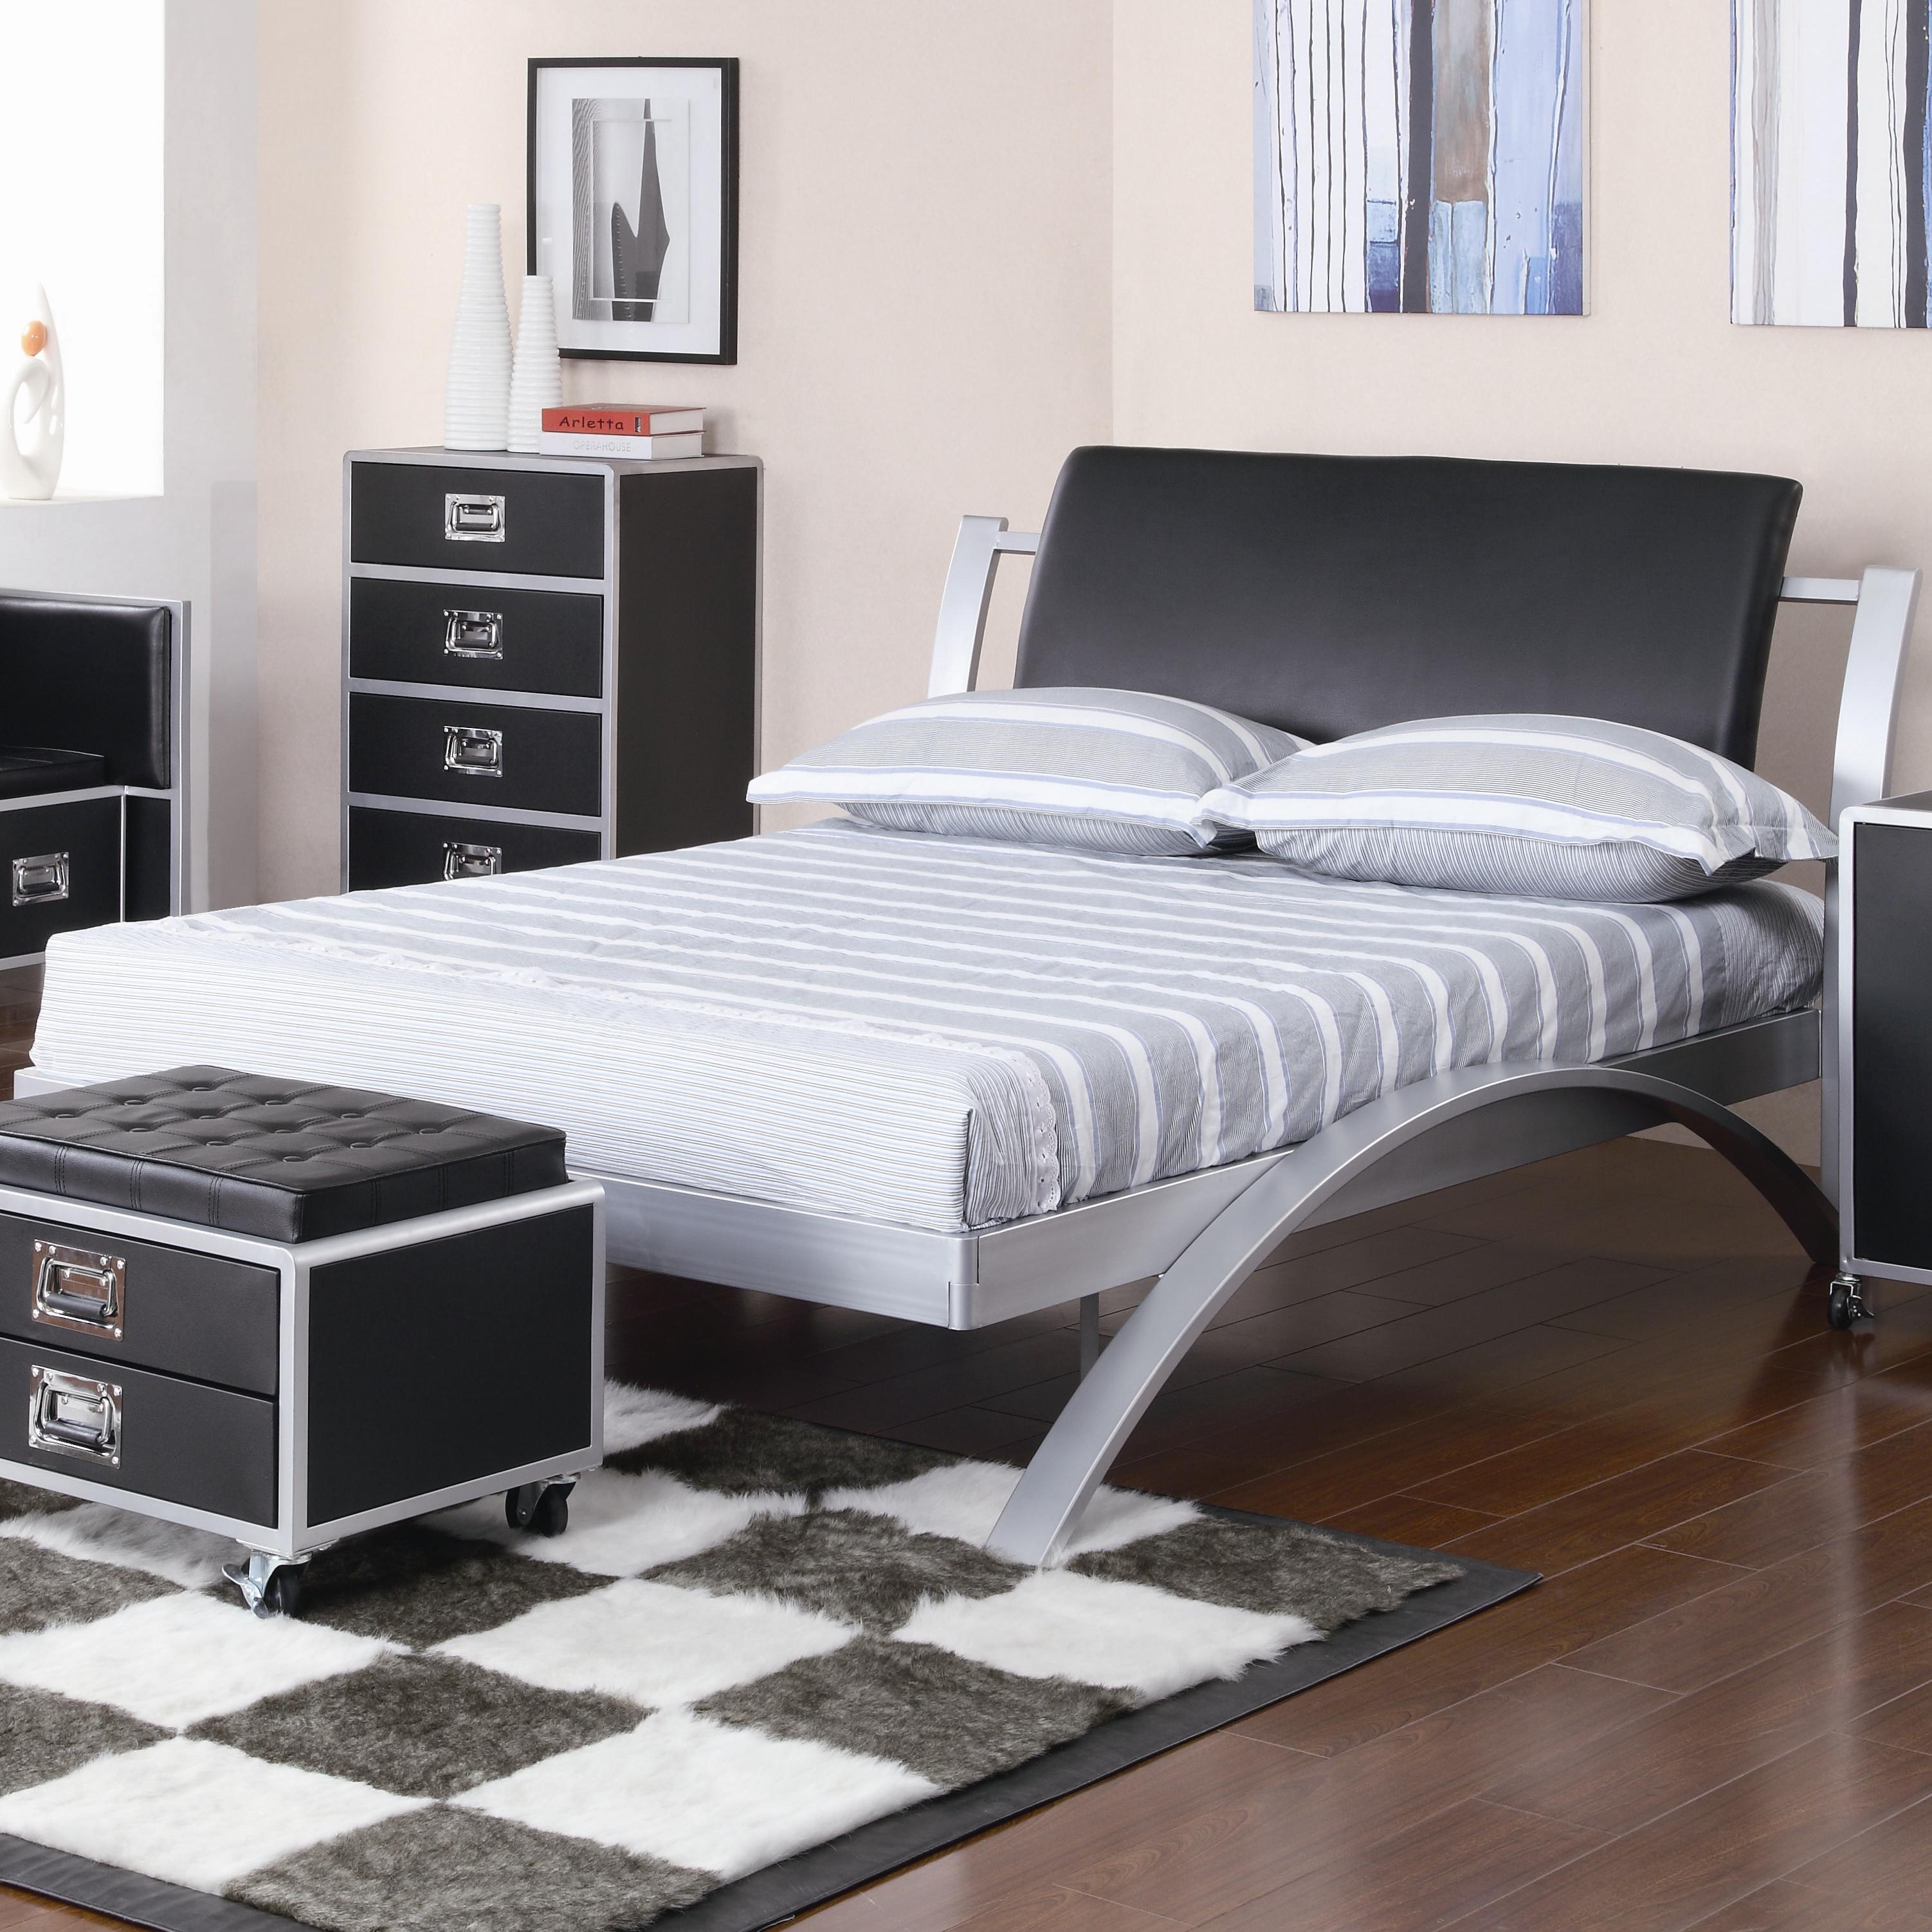 coaster furniture leclair 300200t twin metal platform bed